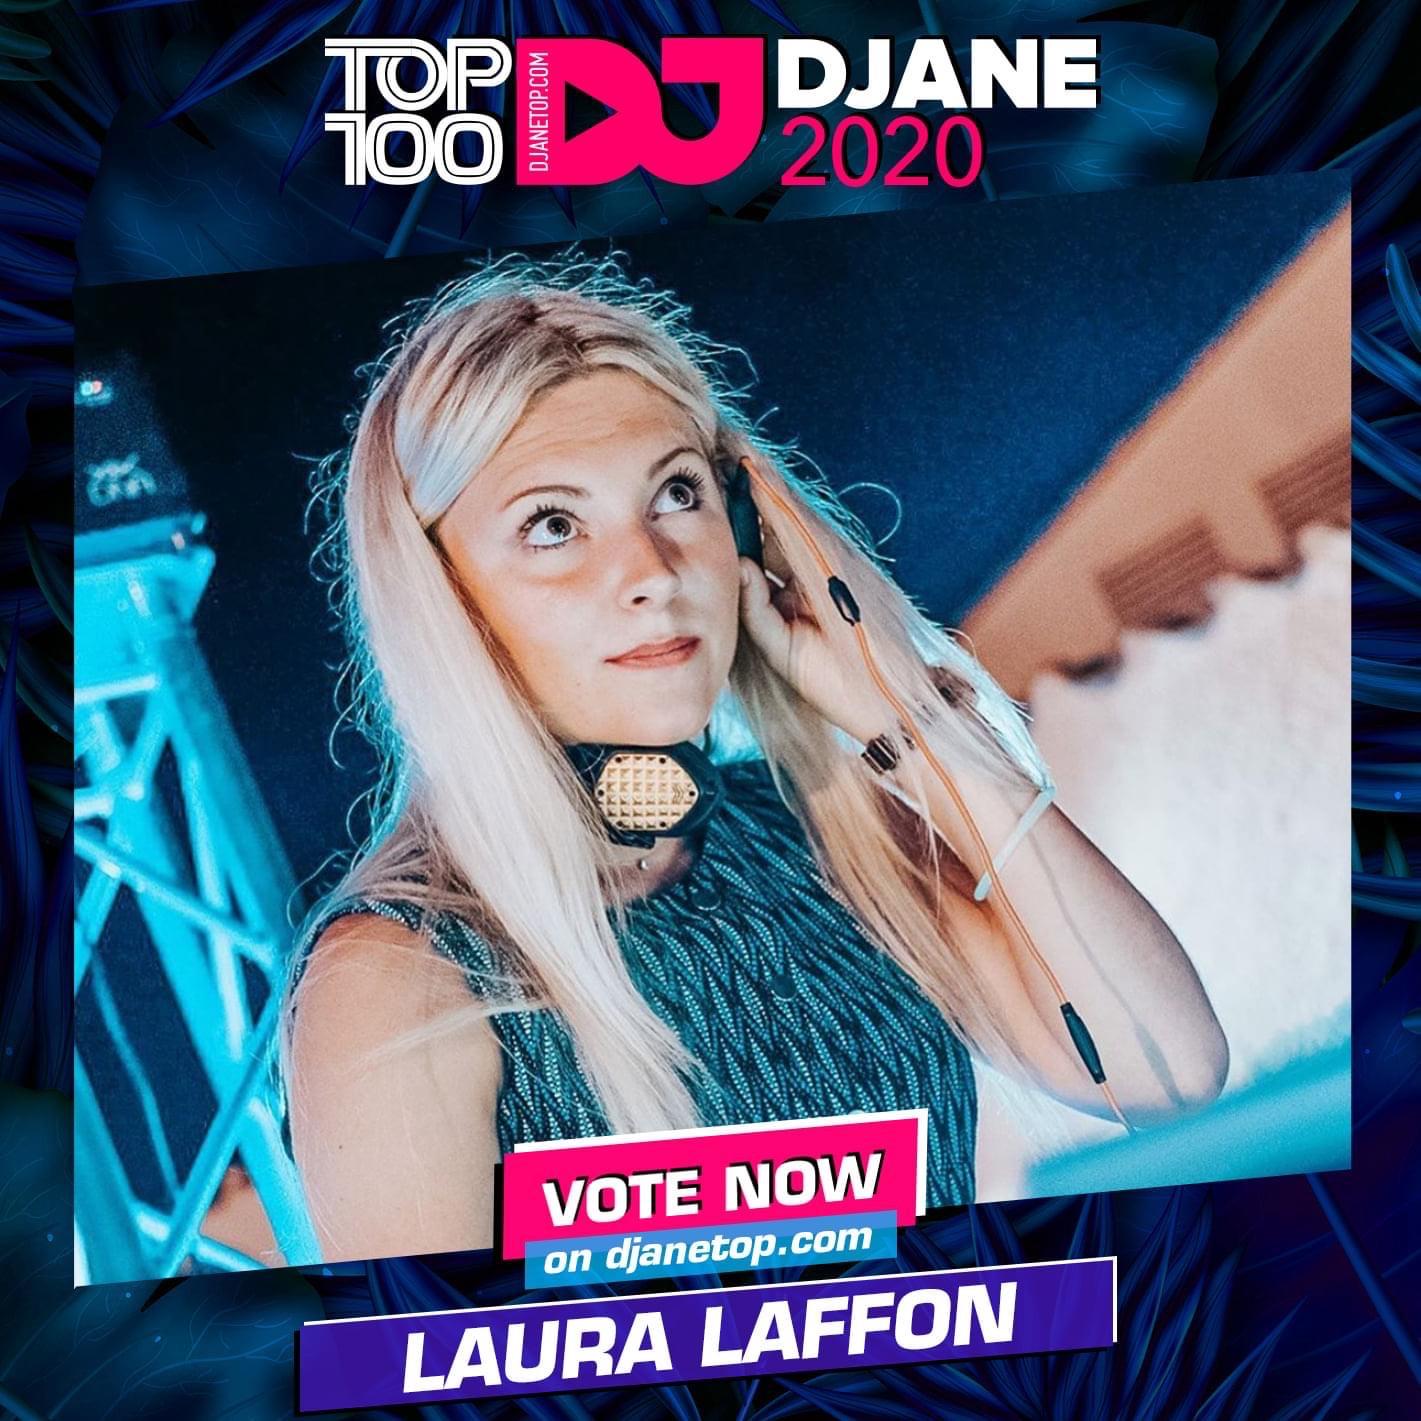 TOP 100 DJANE LAURA LAFFON